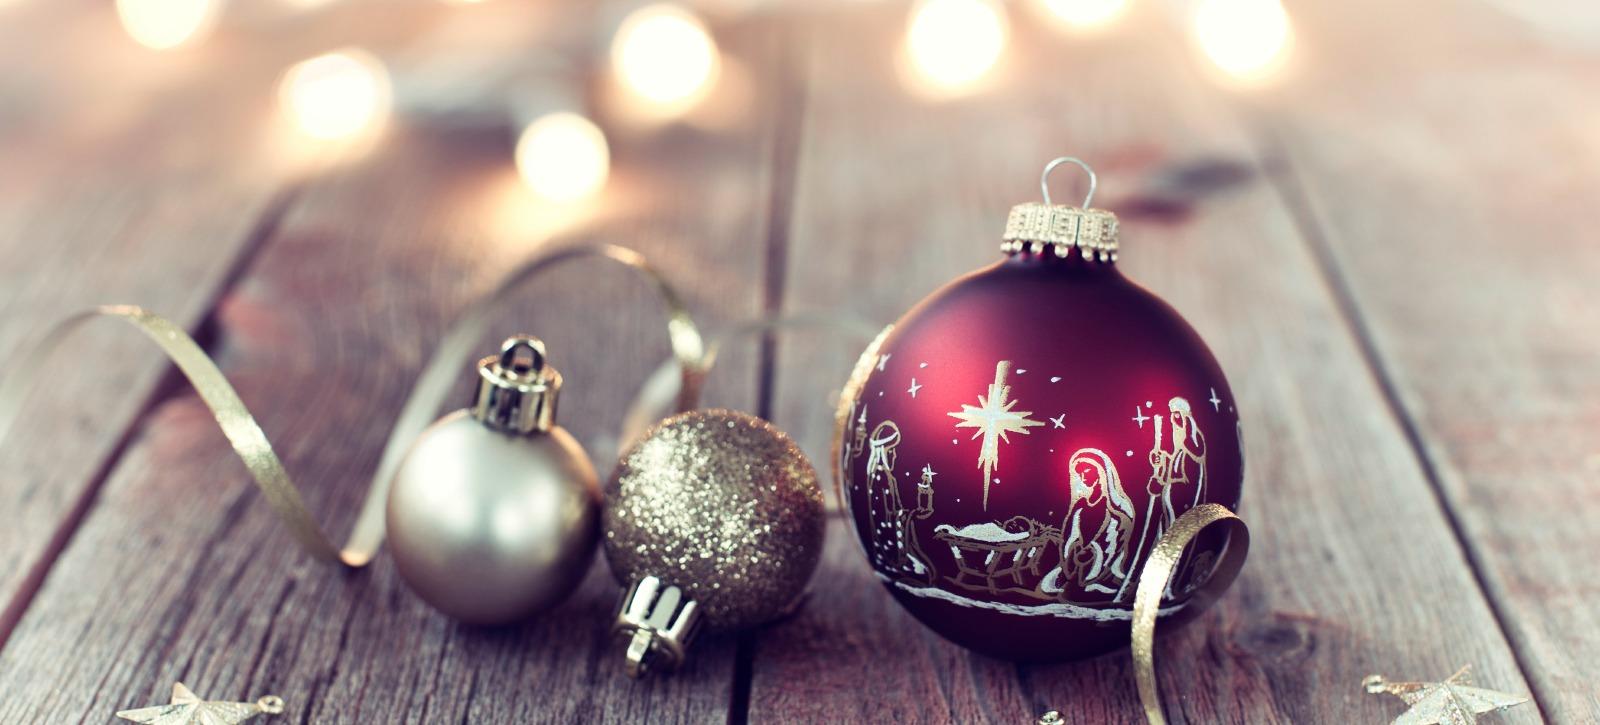 jesus and the gift of christmas